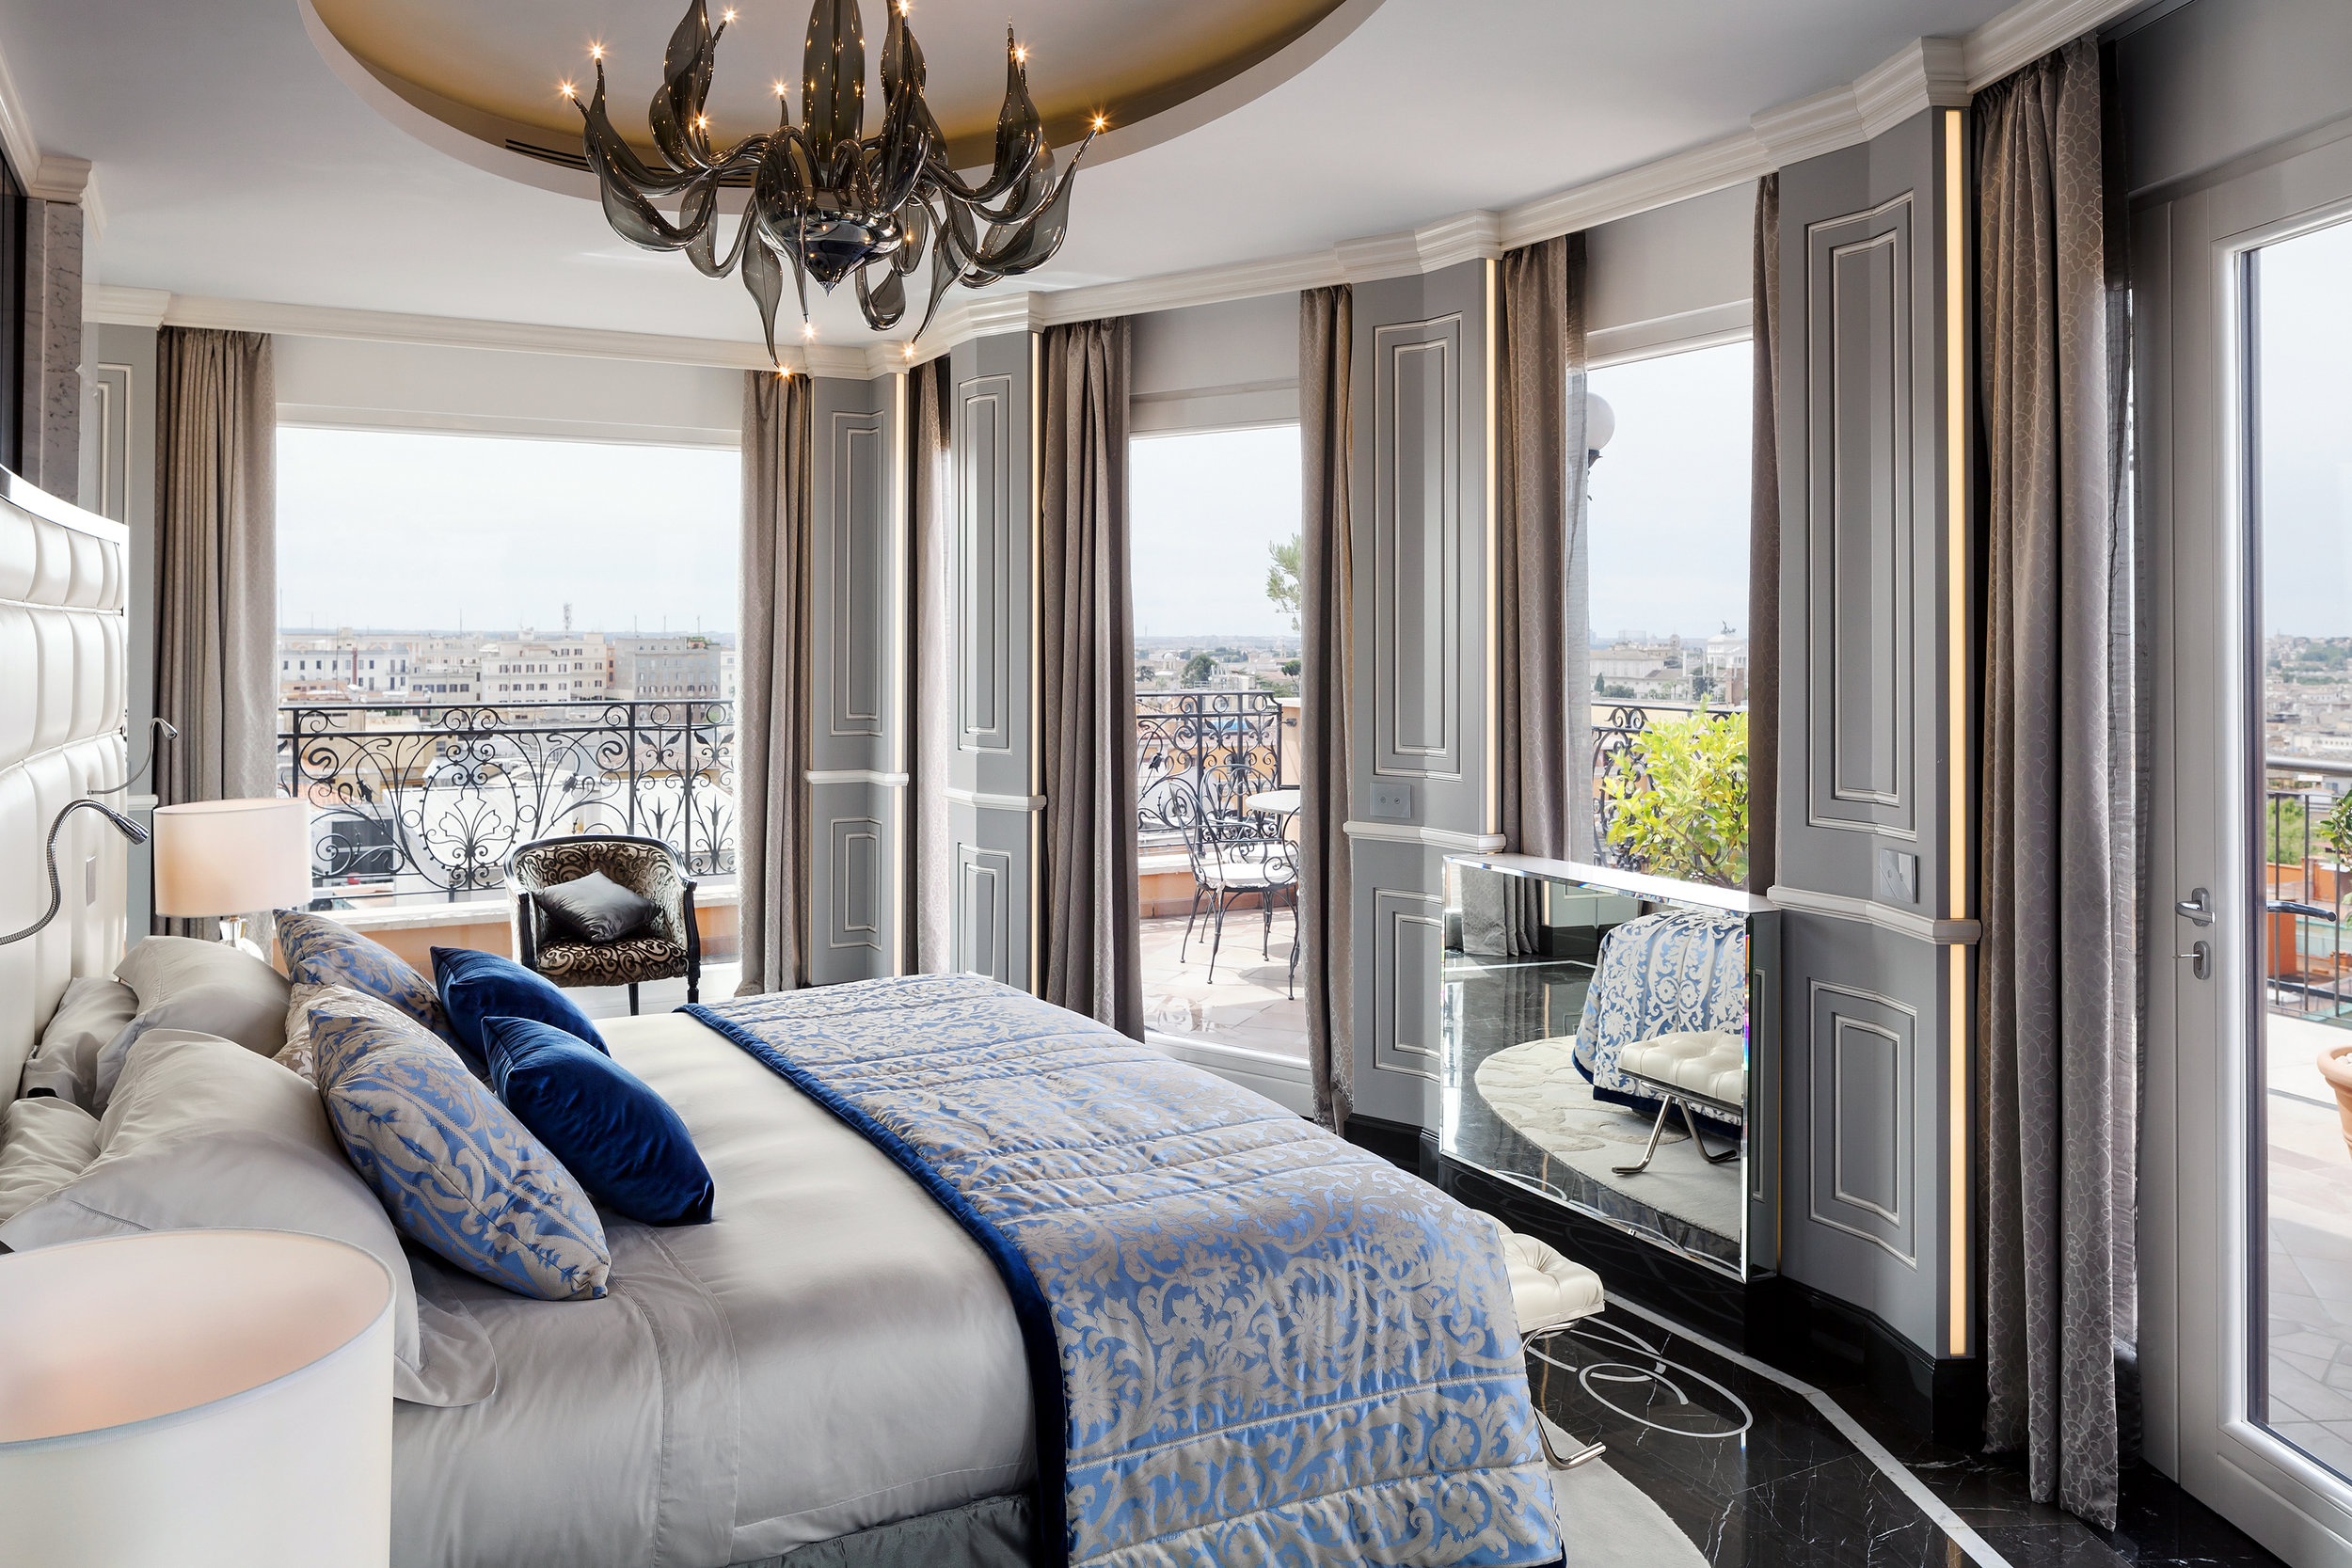 14_Roman_Penthouse_master_bedroom.jpg